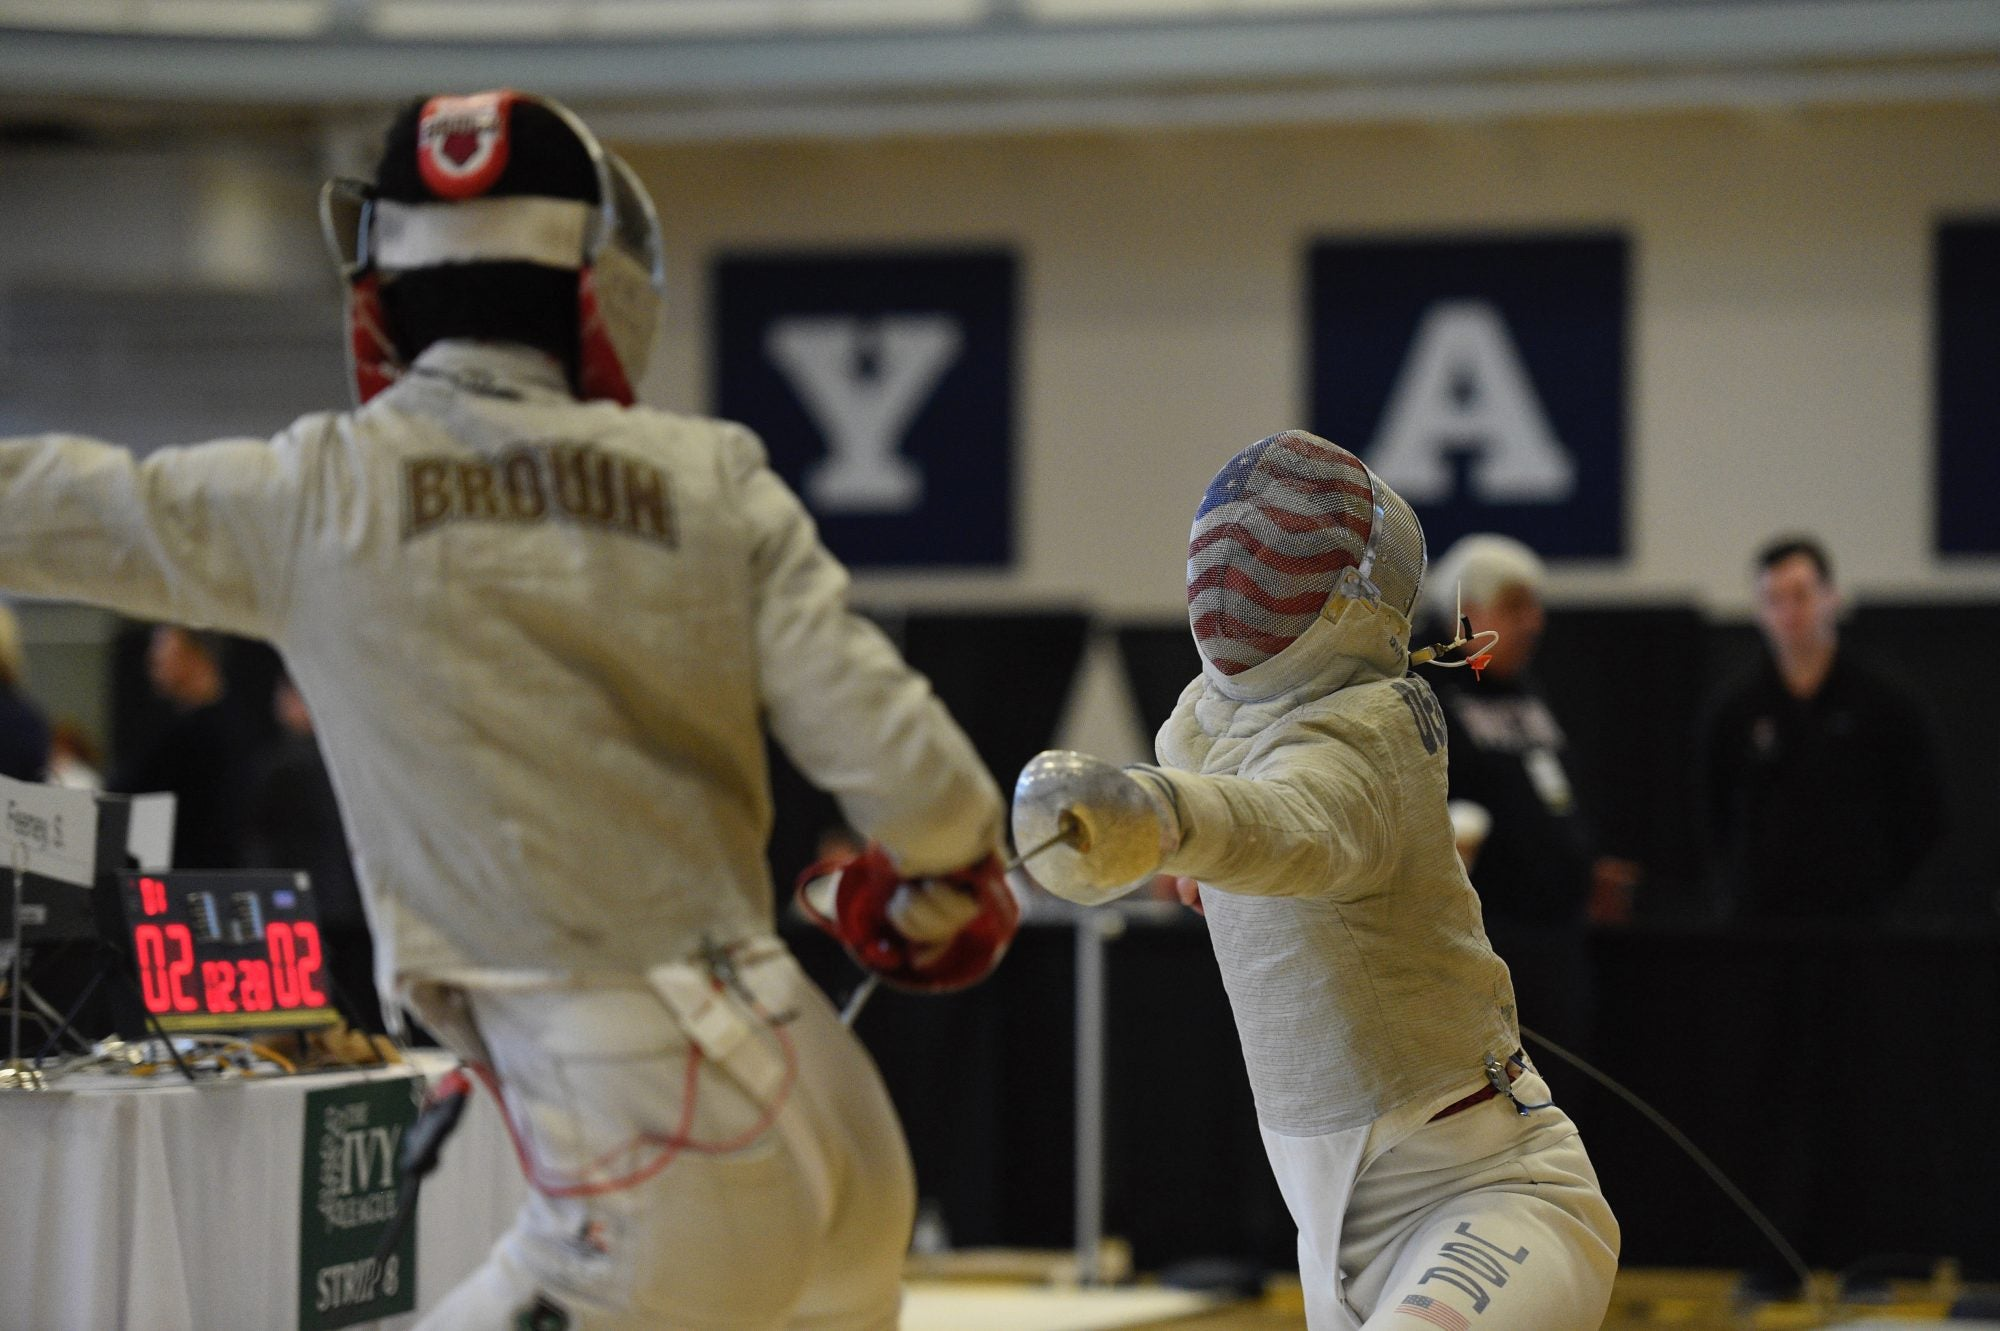 A Harvard student fencing